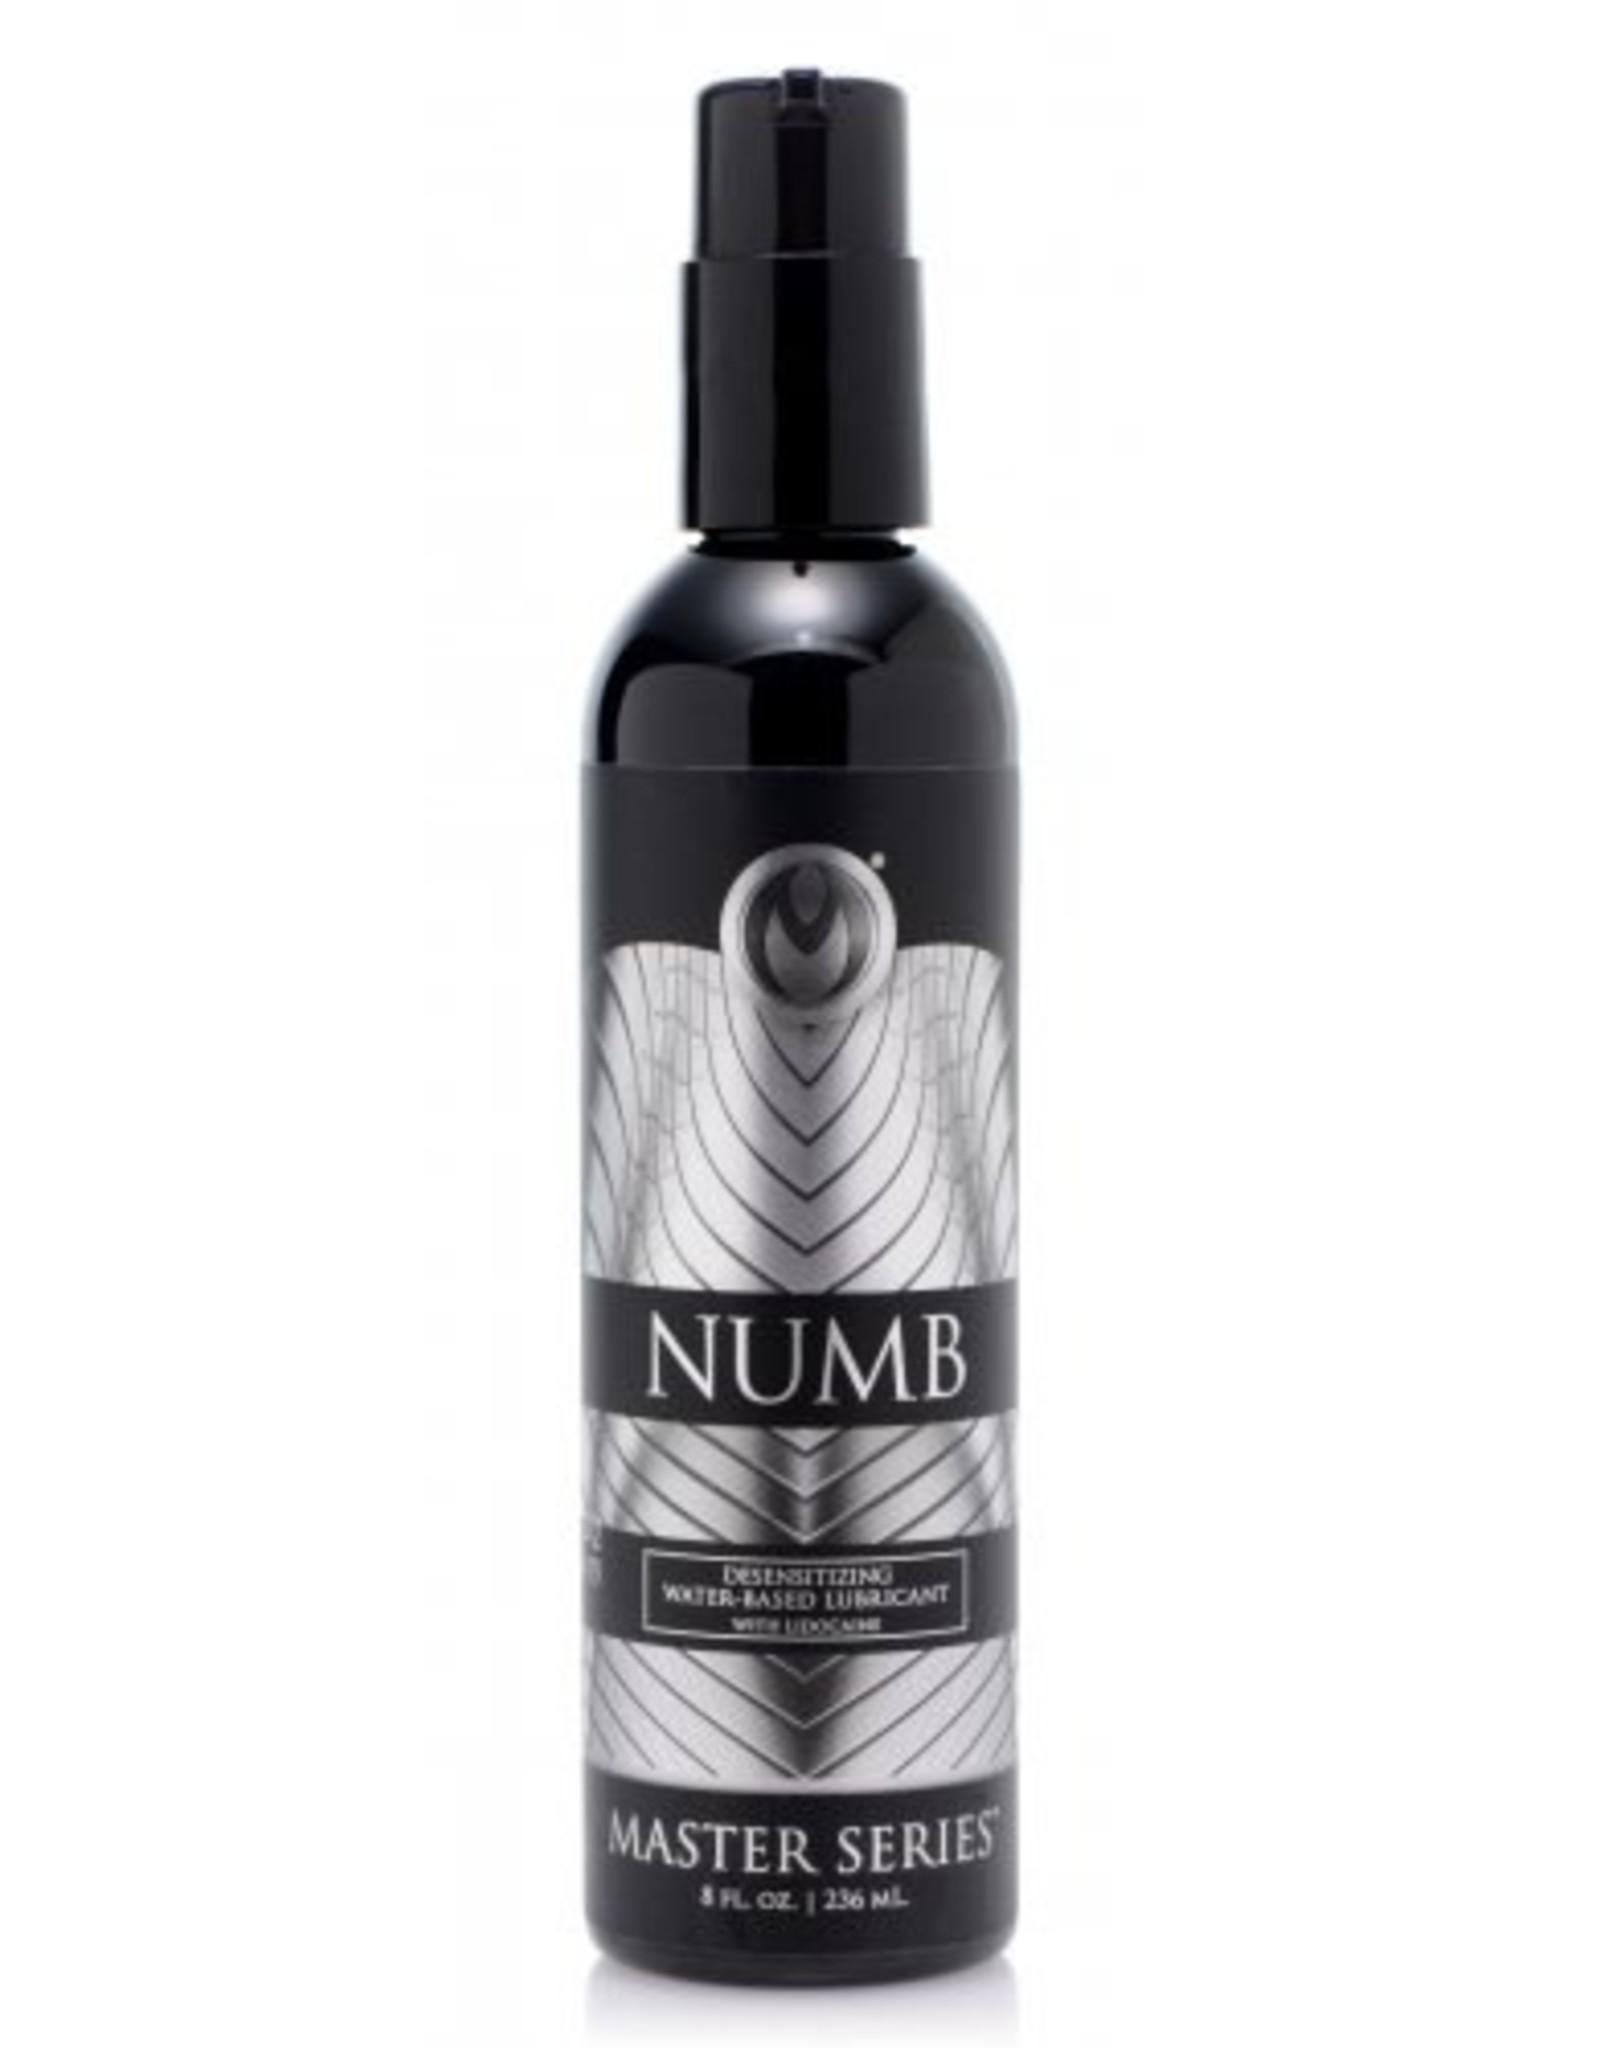 Master Series - Numb Desensitizing Water -Based Lubricant w/ Lidocaine - 8 oz